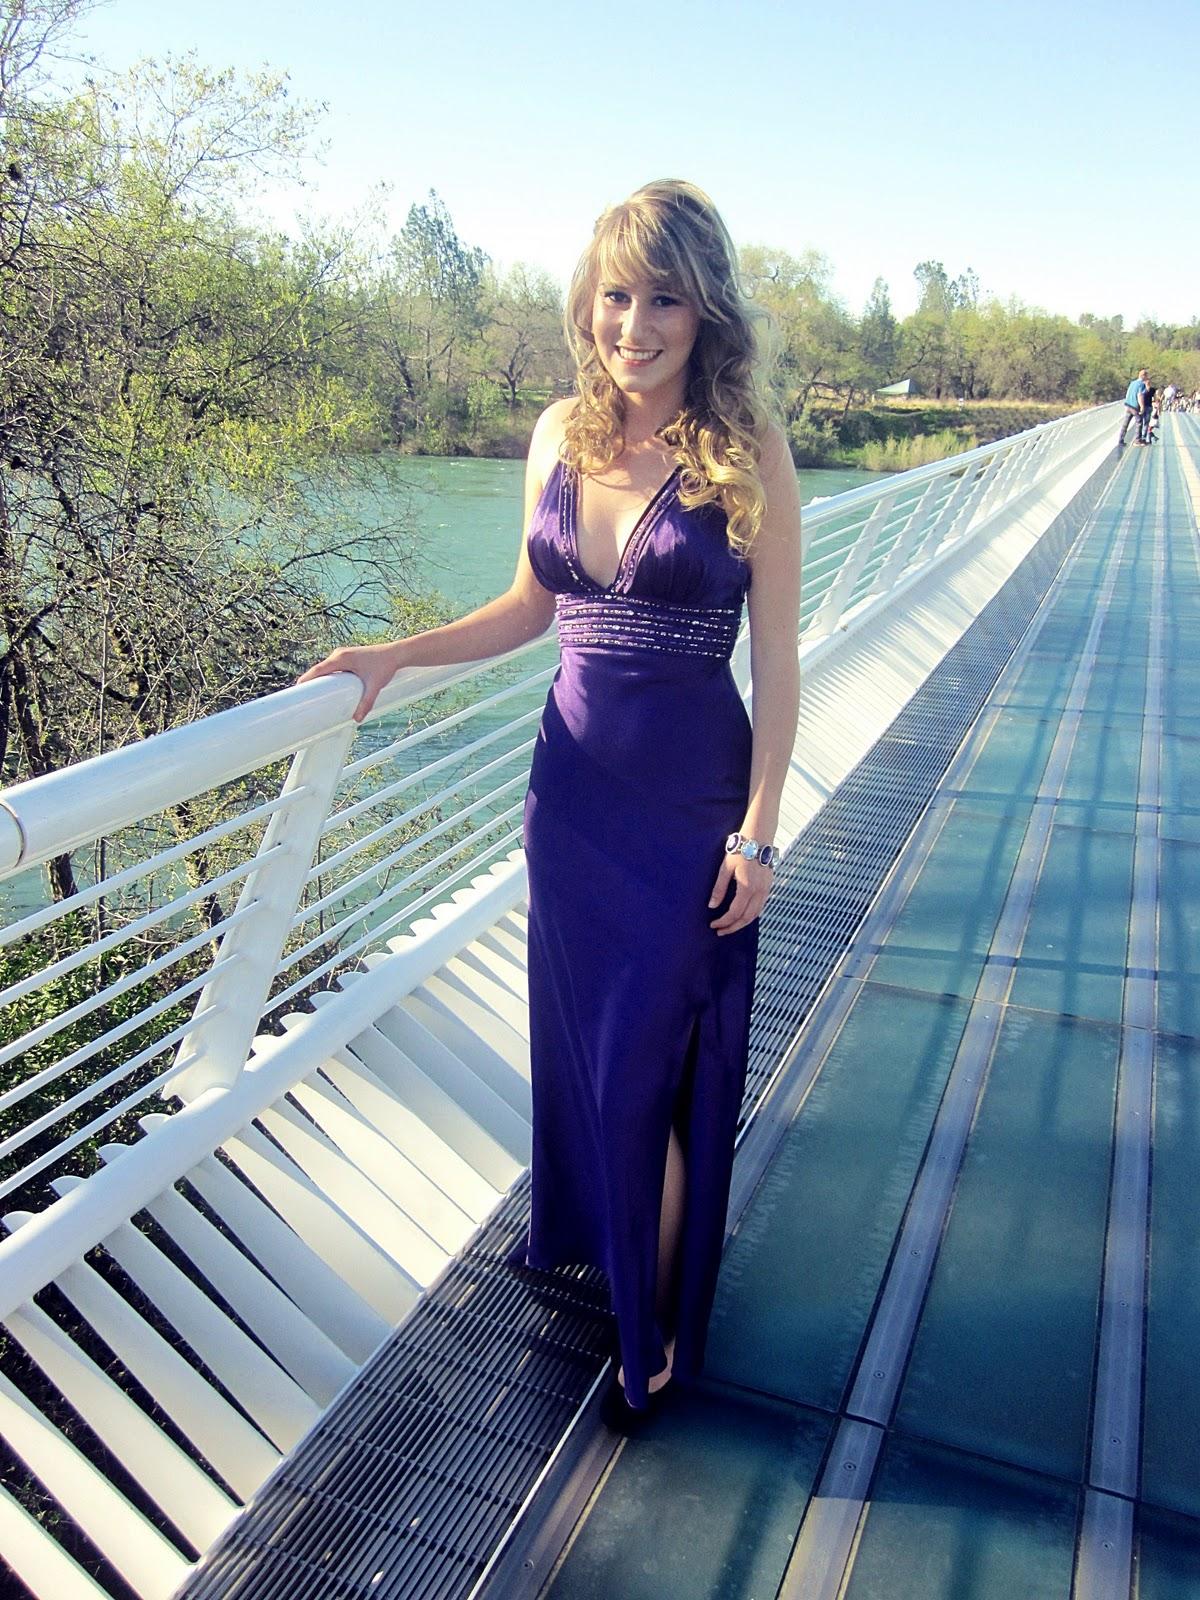 california is where i belong: junior prom